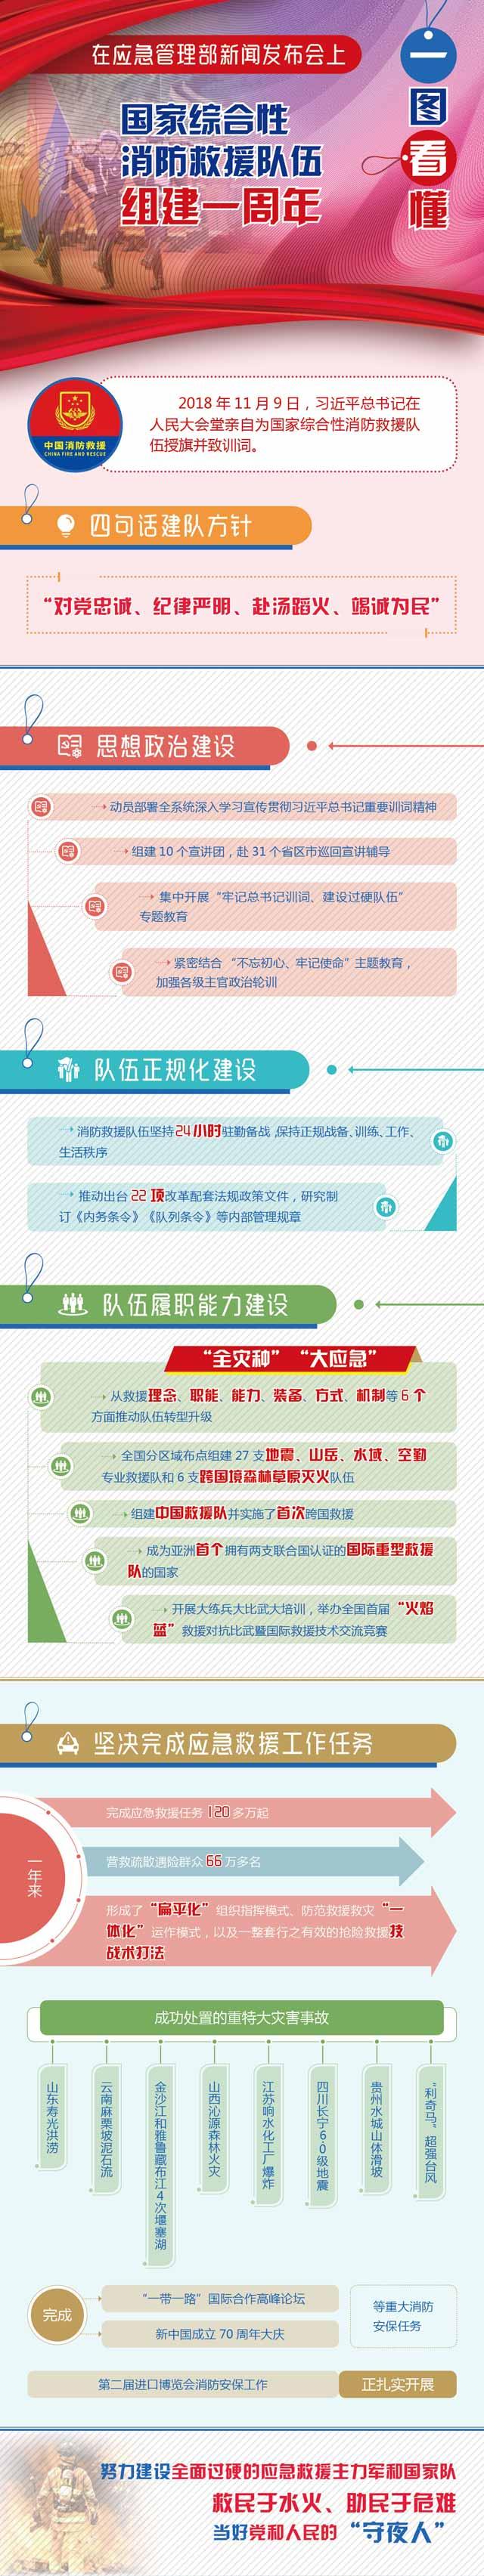 http://www.store4car.com/nenyuan/1143236.html